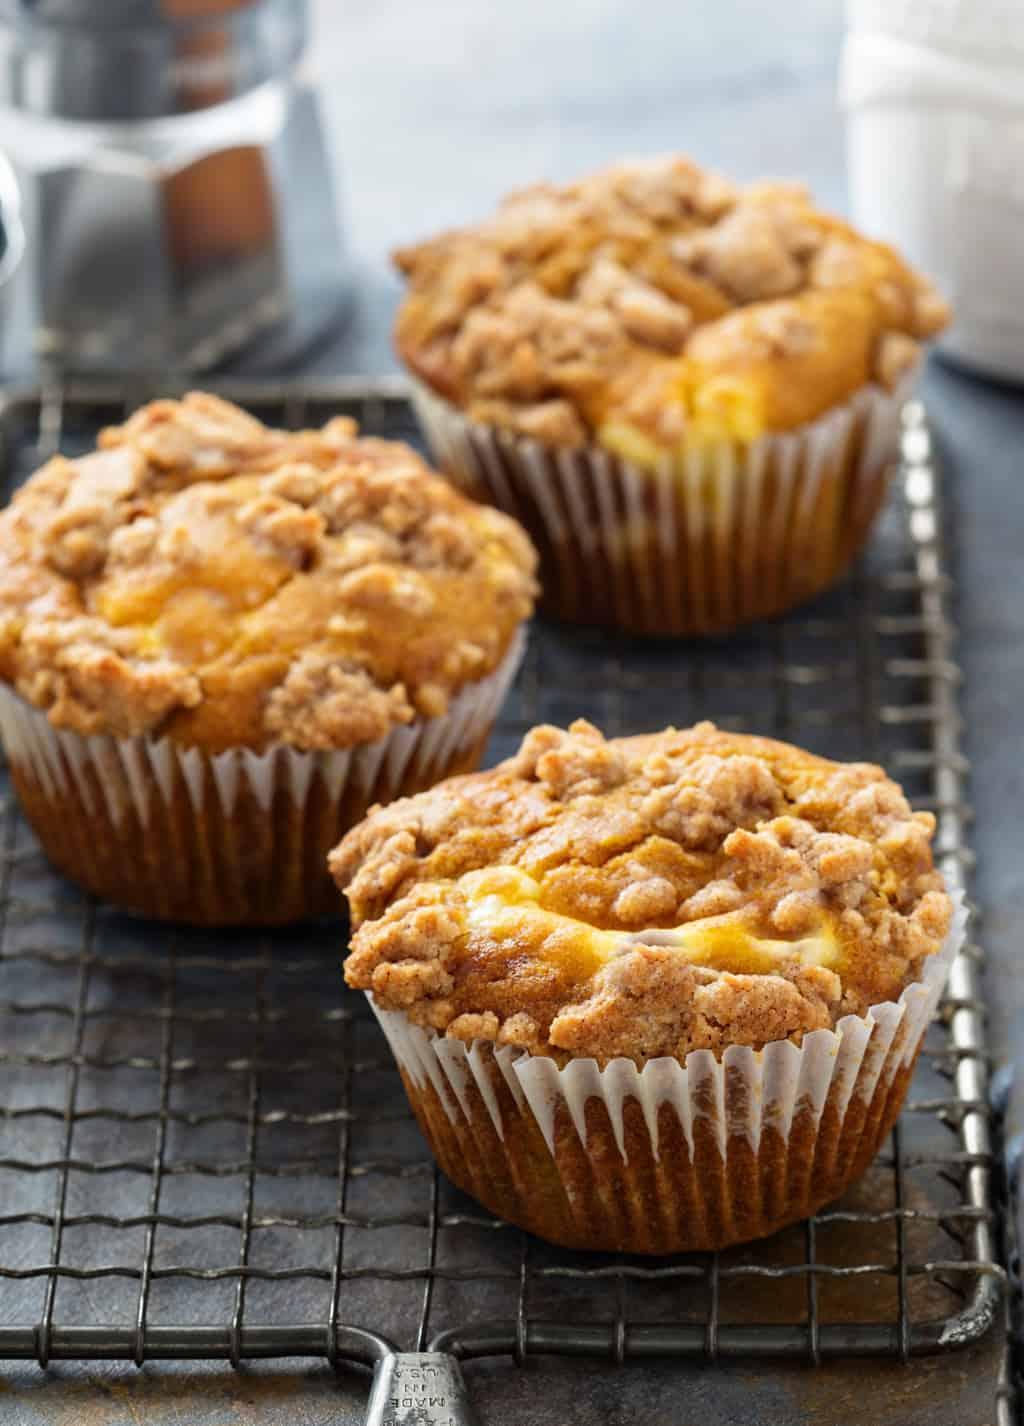 keto pumpkin cheesecake muffins on a baking rack cooling